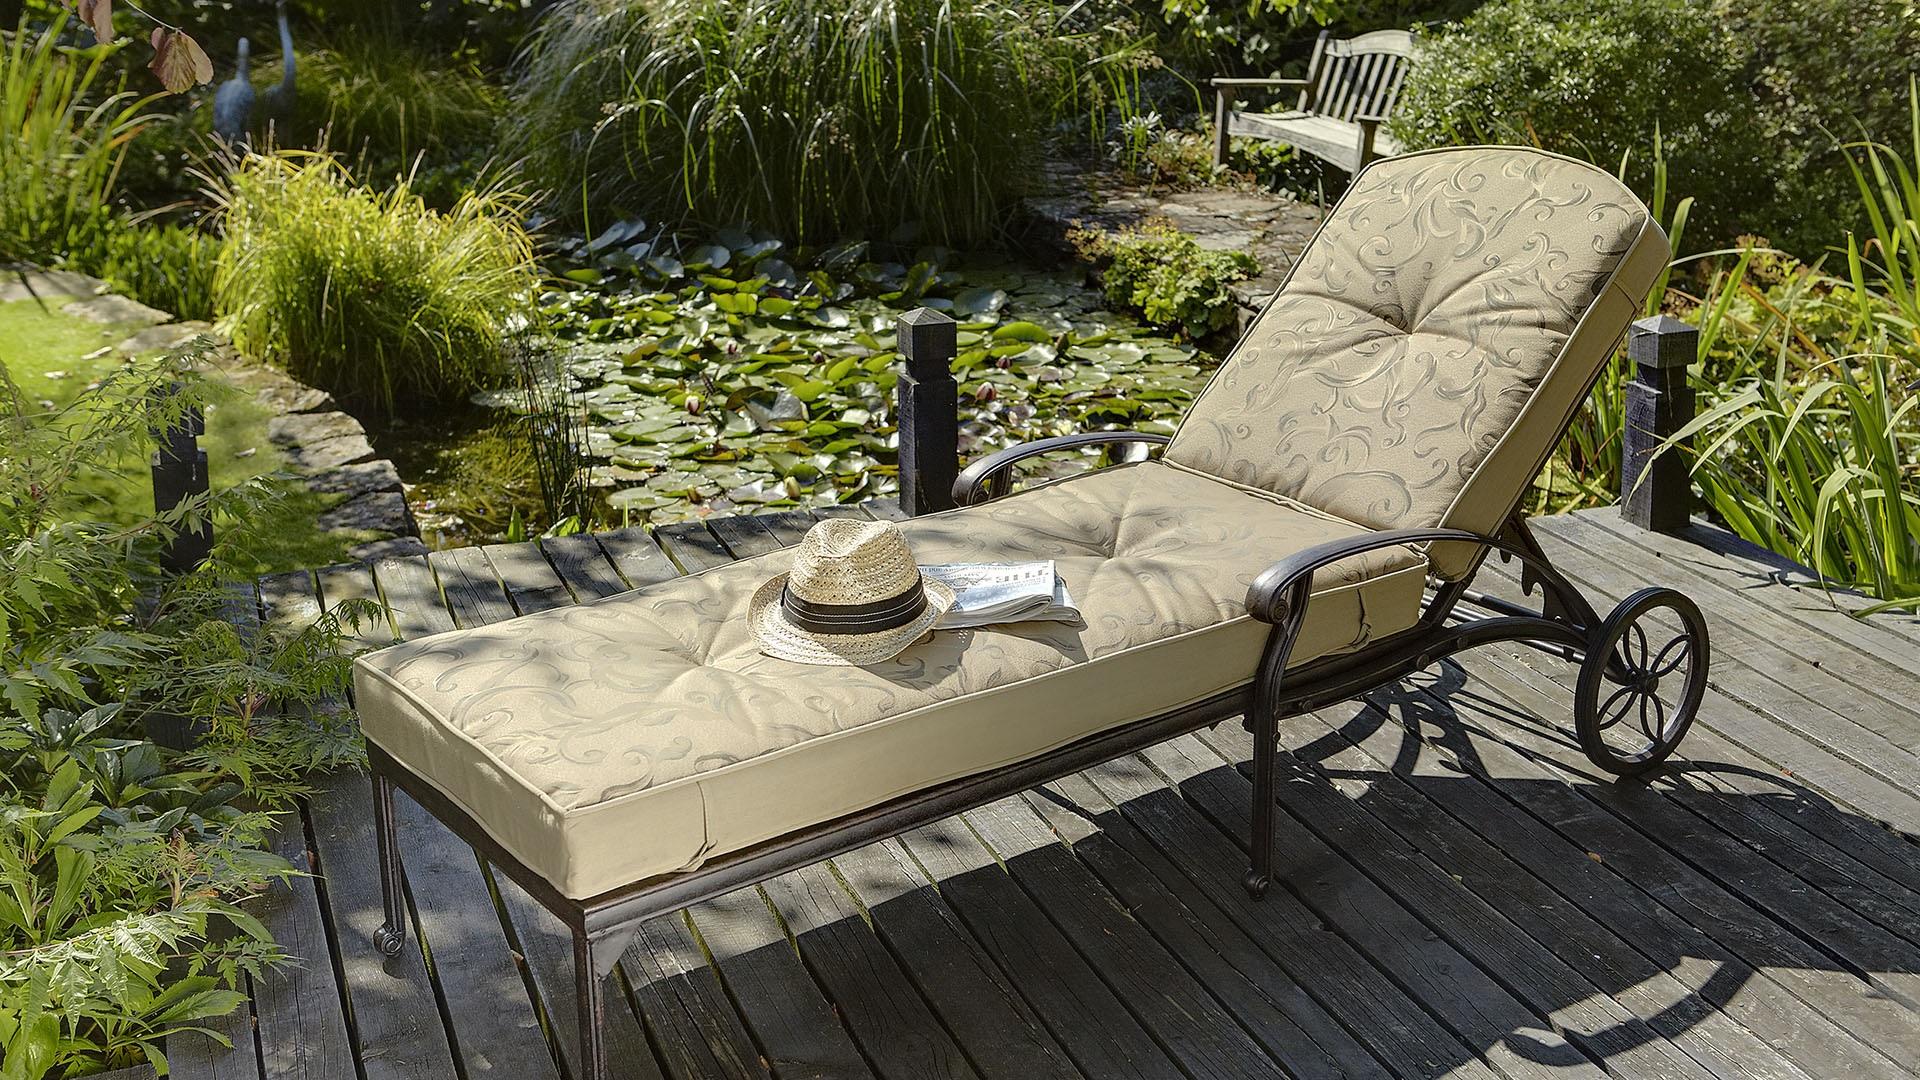 amalfi cast aluminium garden lounger uk 355 garden4less uk shop. Black Bedroom Furniture Sets. Home Design Ideas